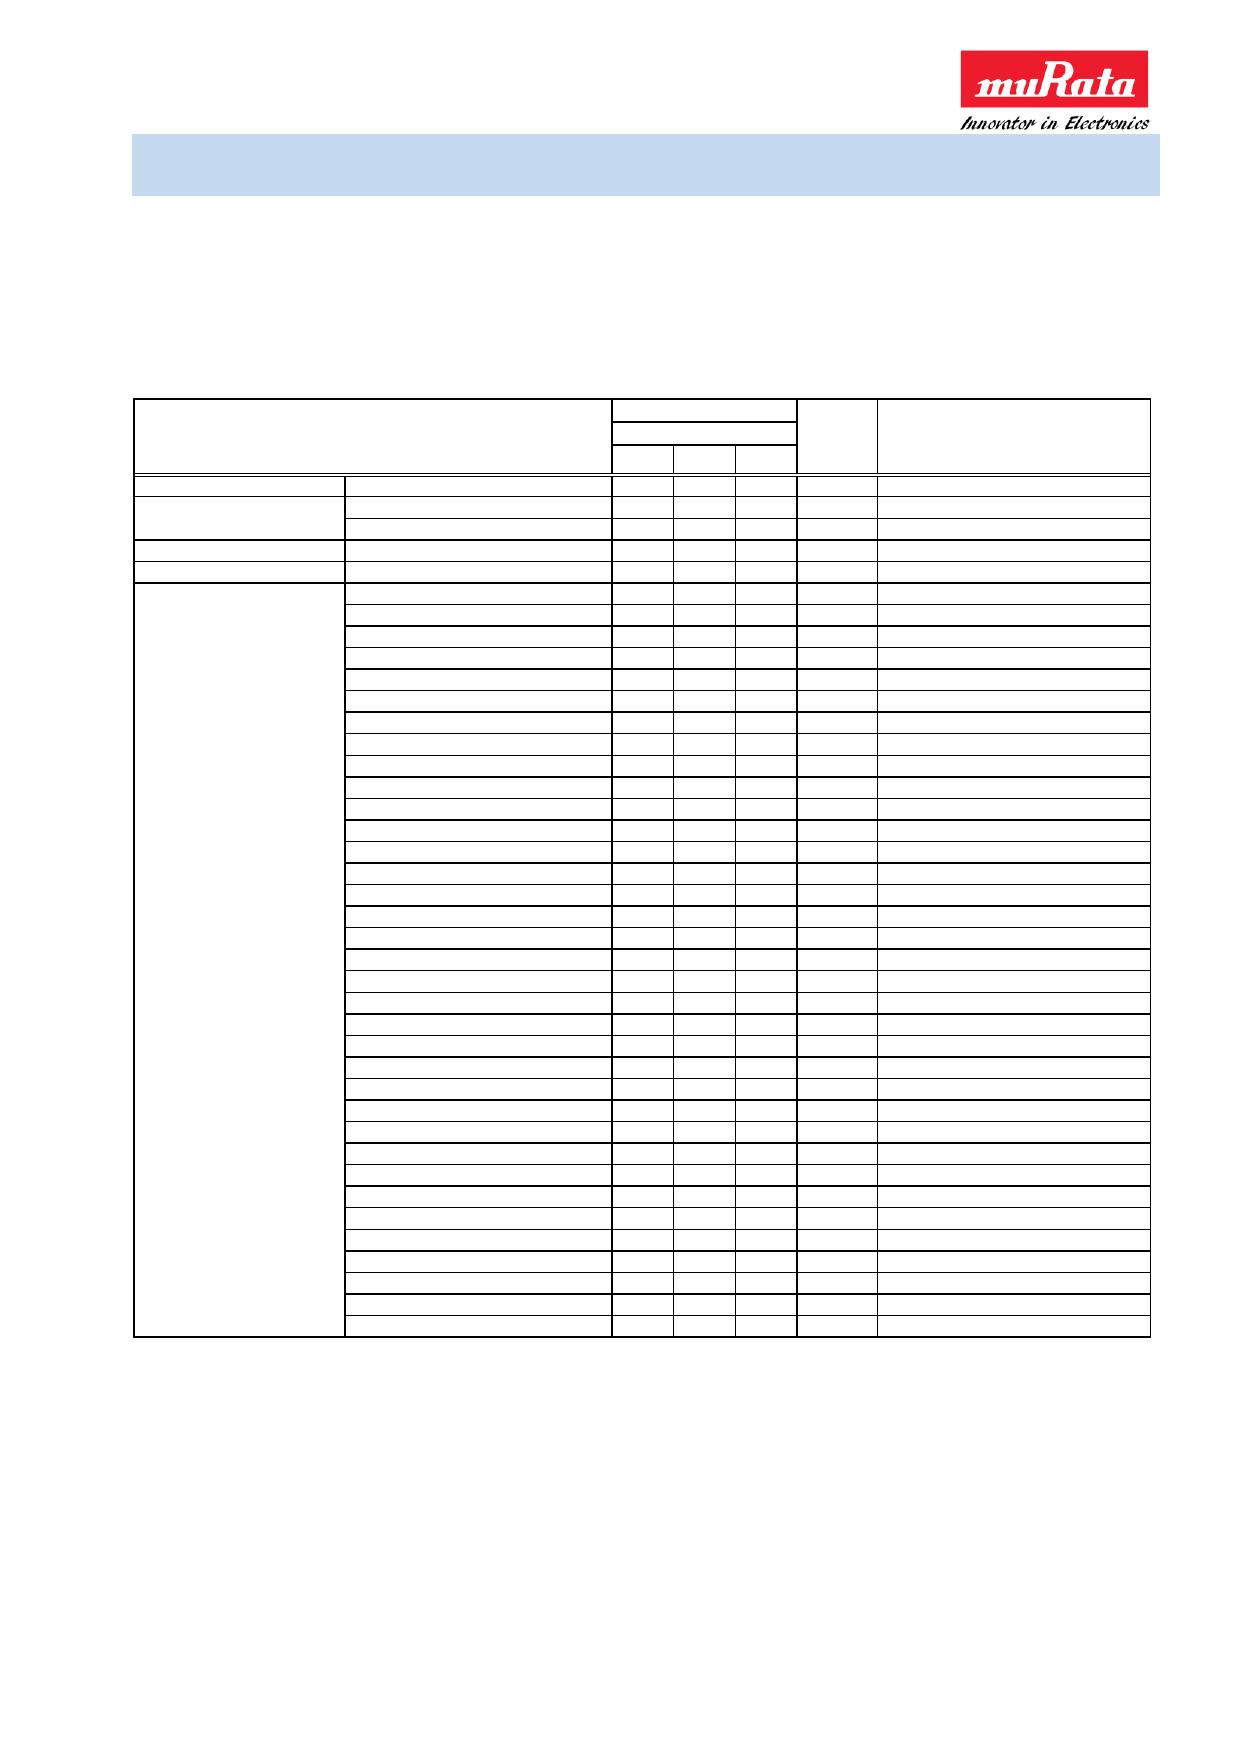 SAFFB806MAA0F0A pdf, 반도체, 판매, 대치품